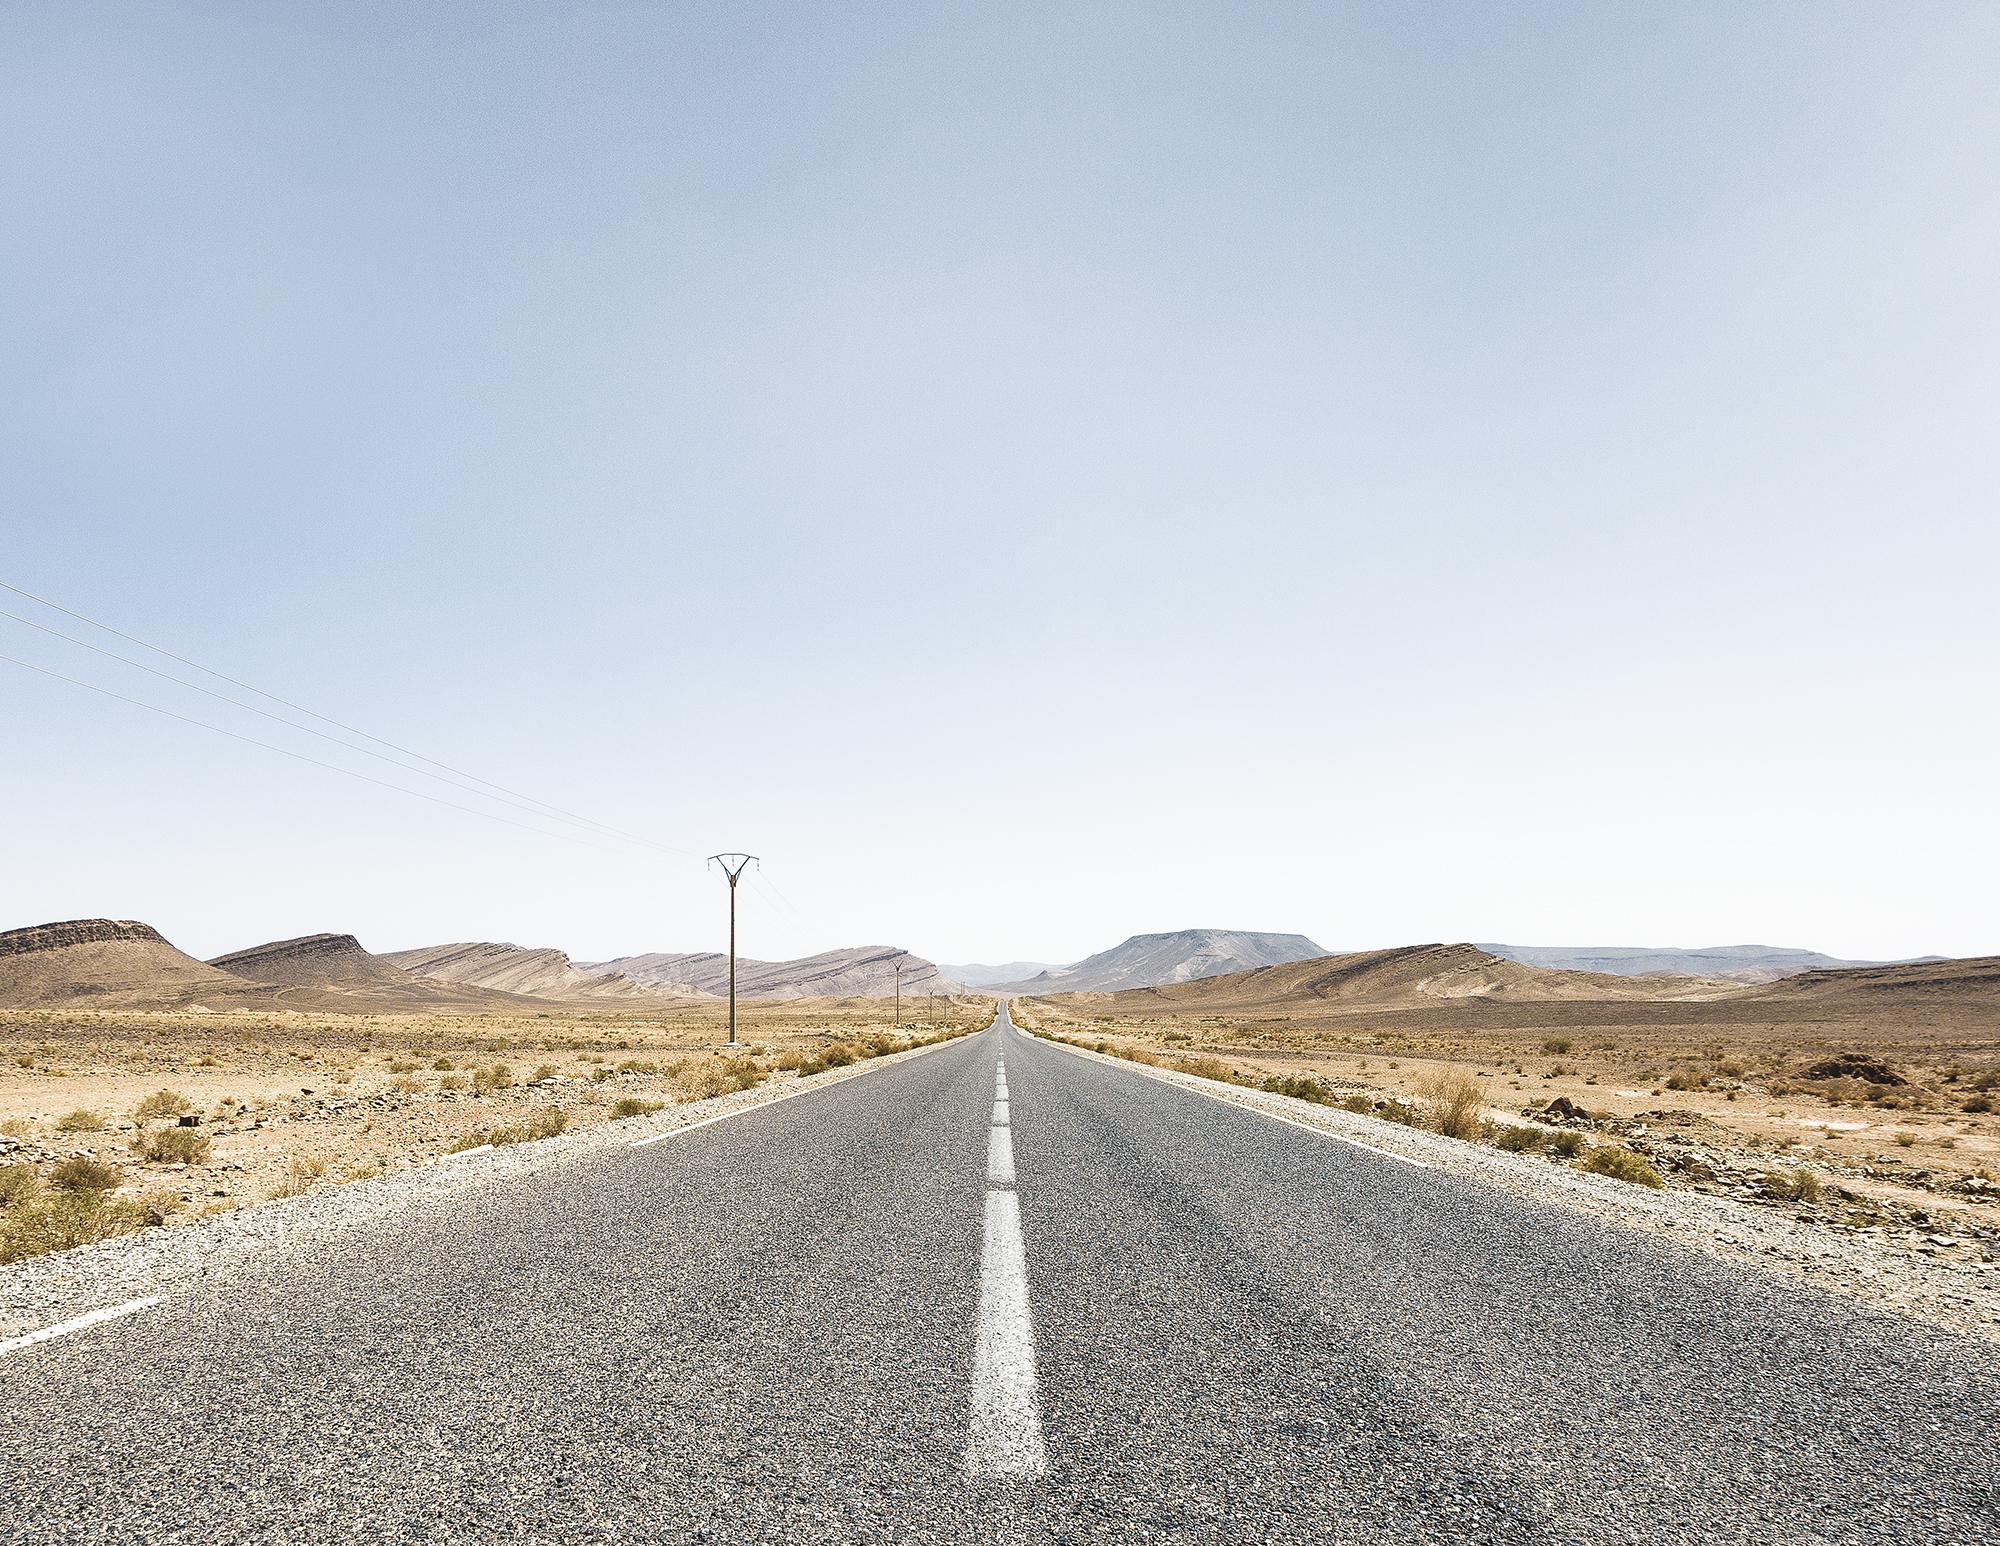 moroccan_roads_nunoserrao.jpg